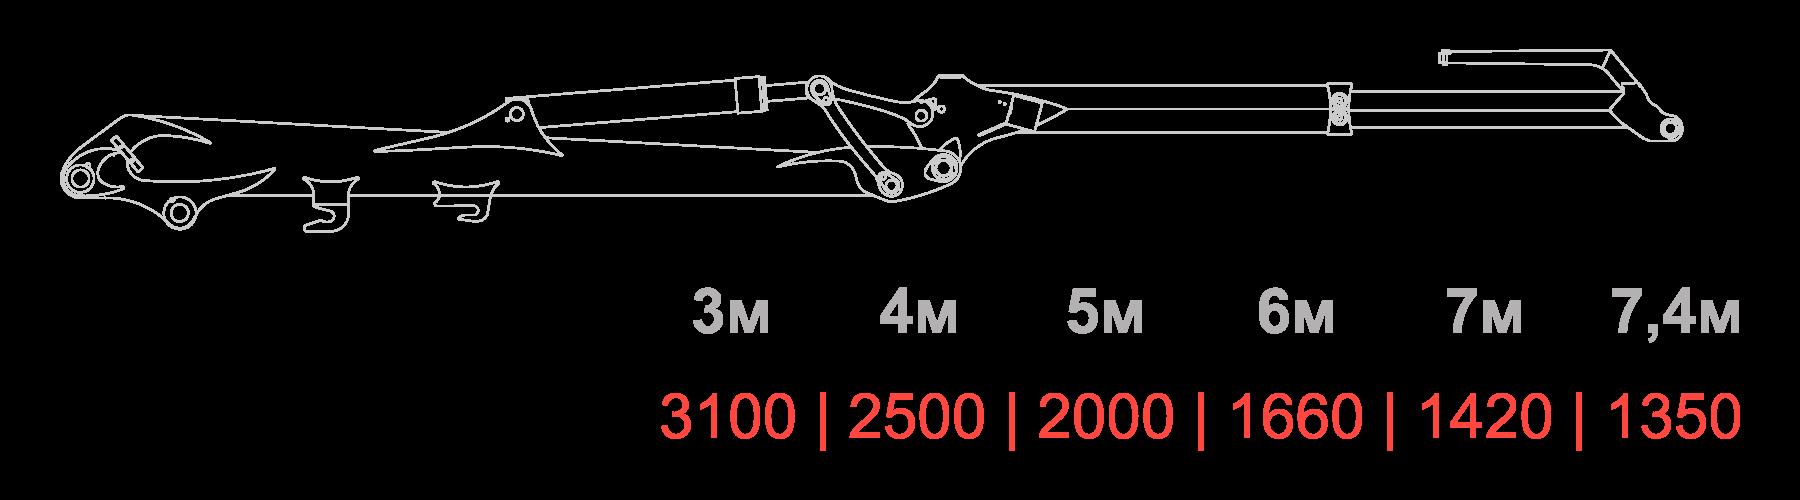 Схема грузоподъемности VM10L74